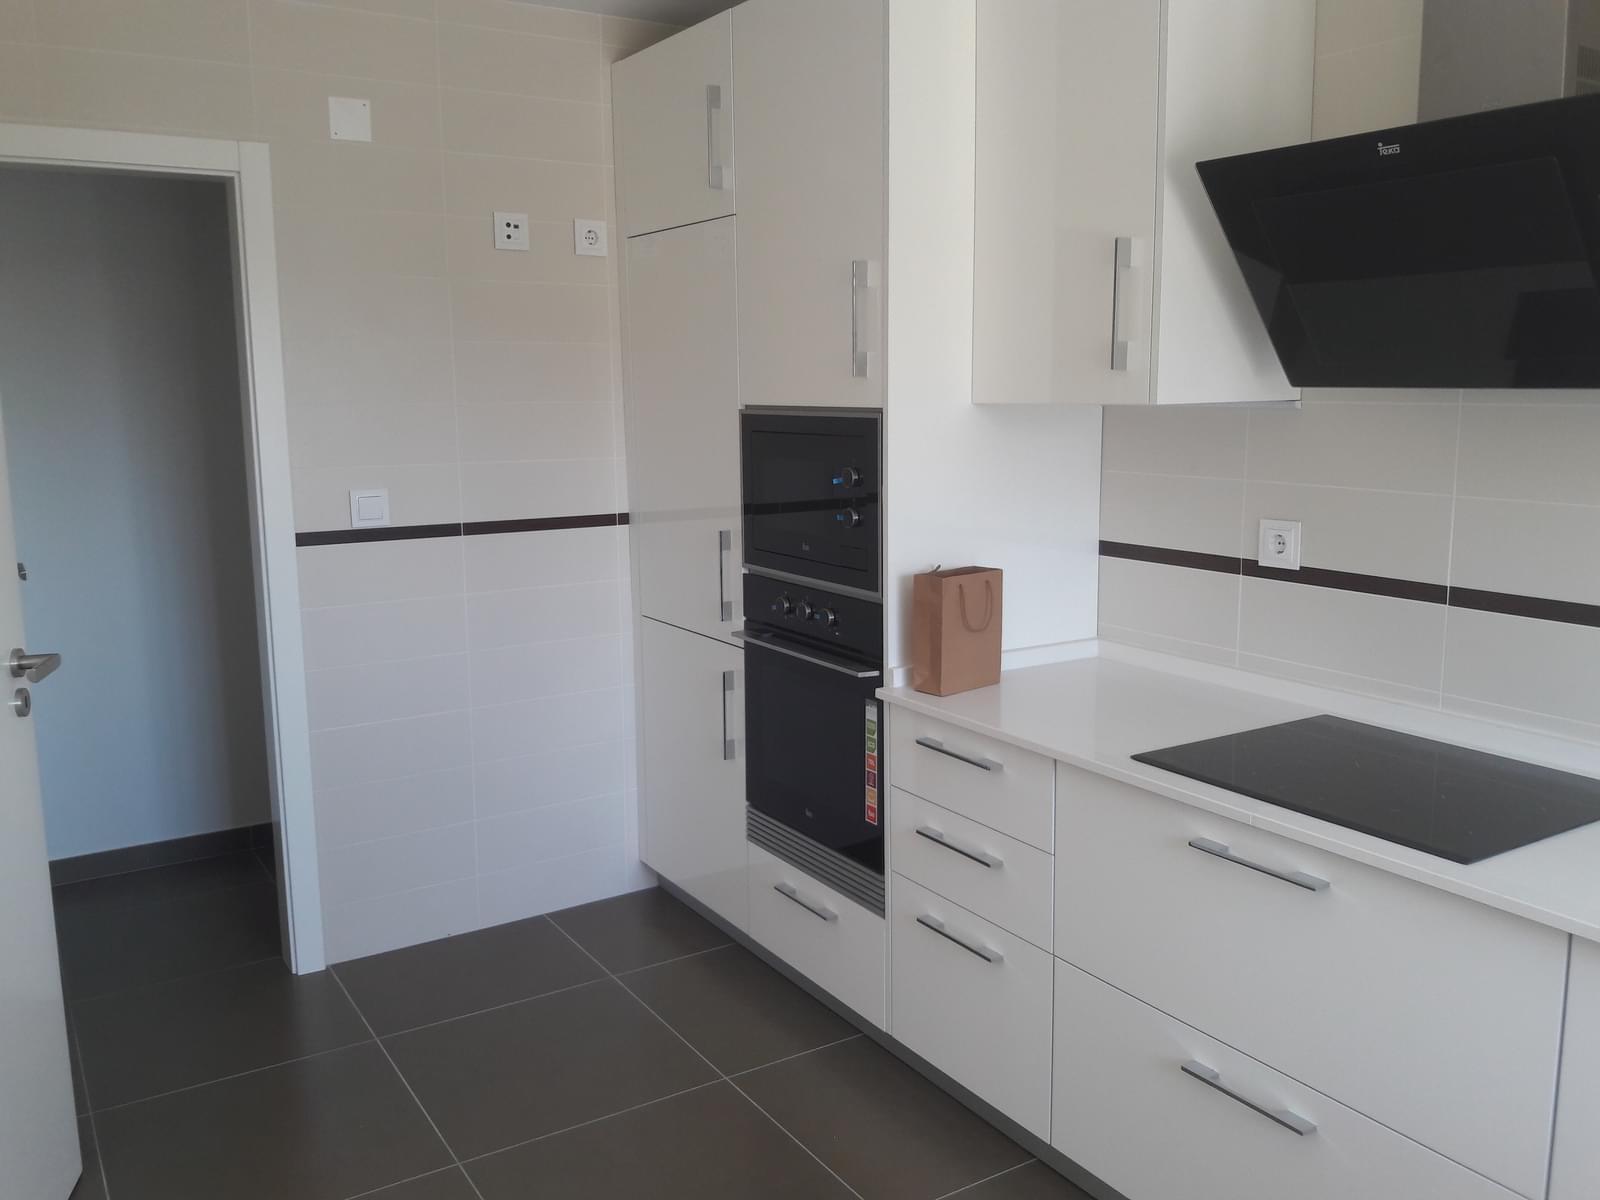 pf18025-apartamento-t3-7033cc0c-1d64-4fea-98b3-ad143c7788c2